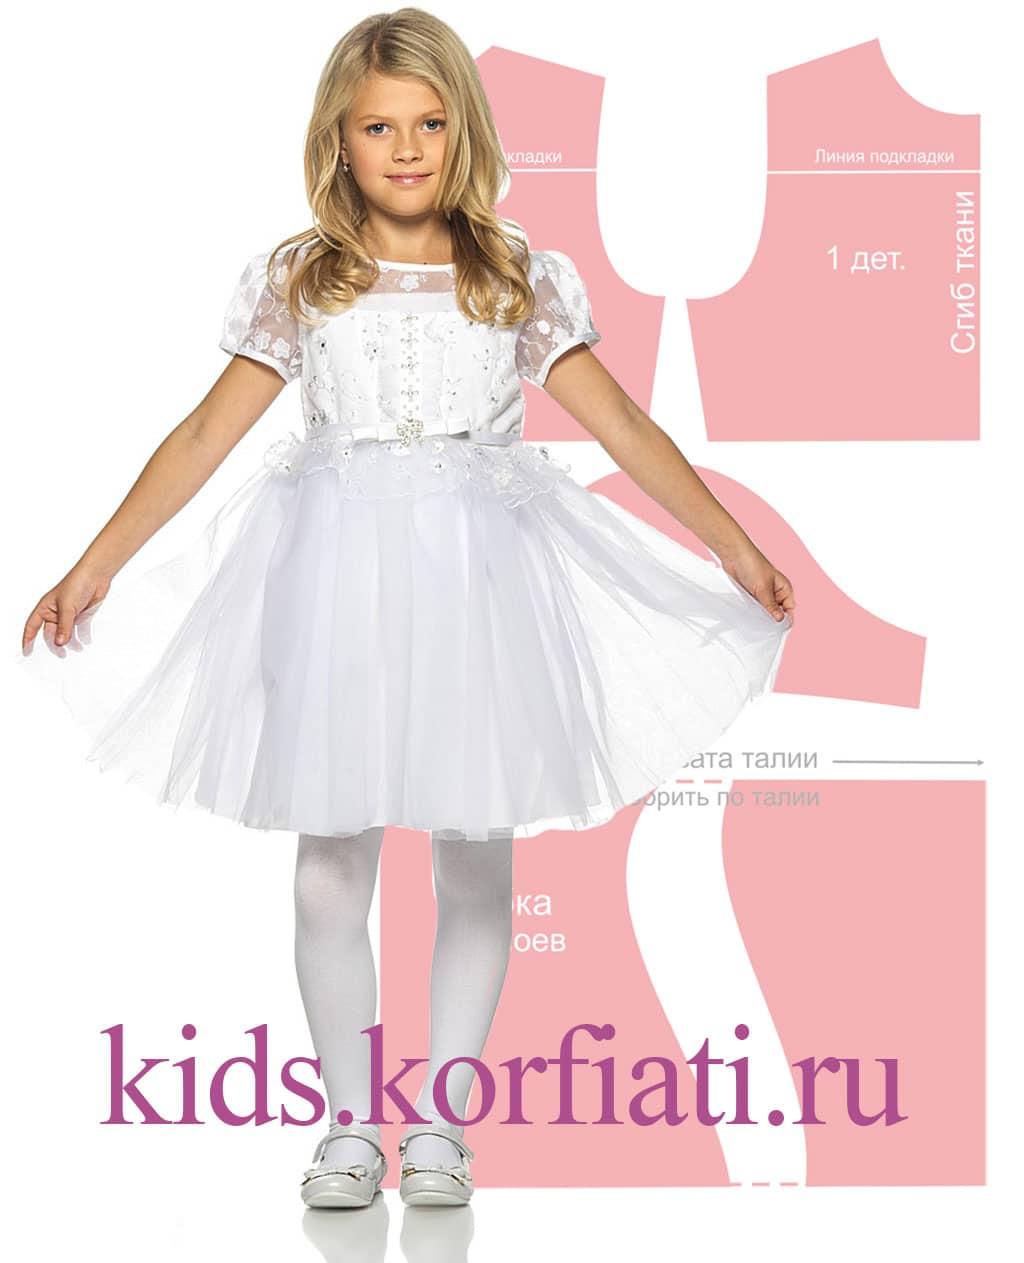 Подростки выкройка девочки юбка фото 963